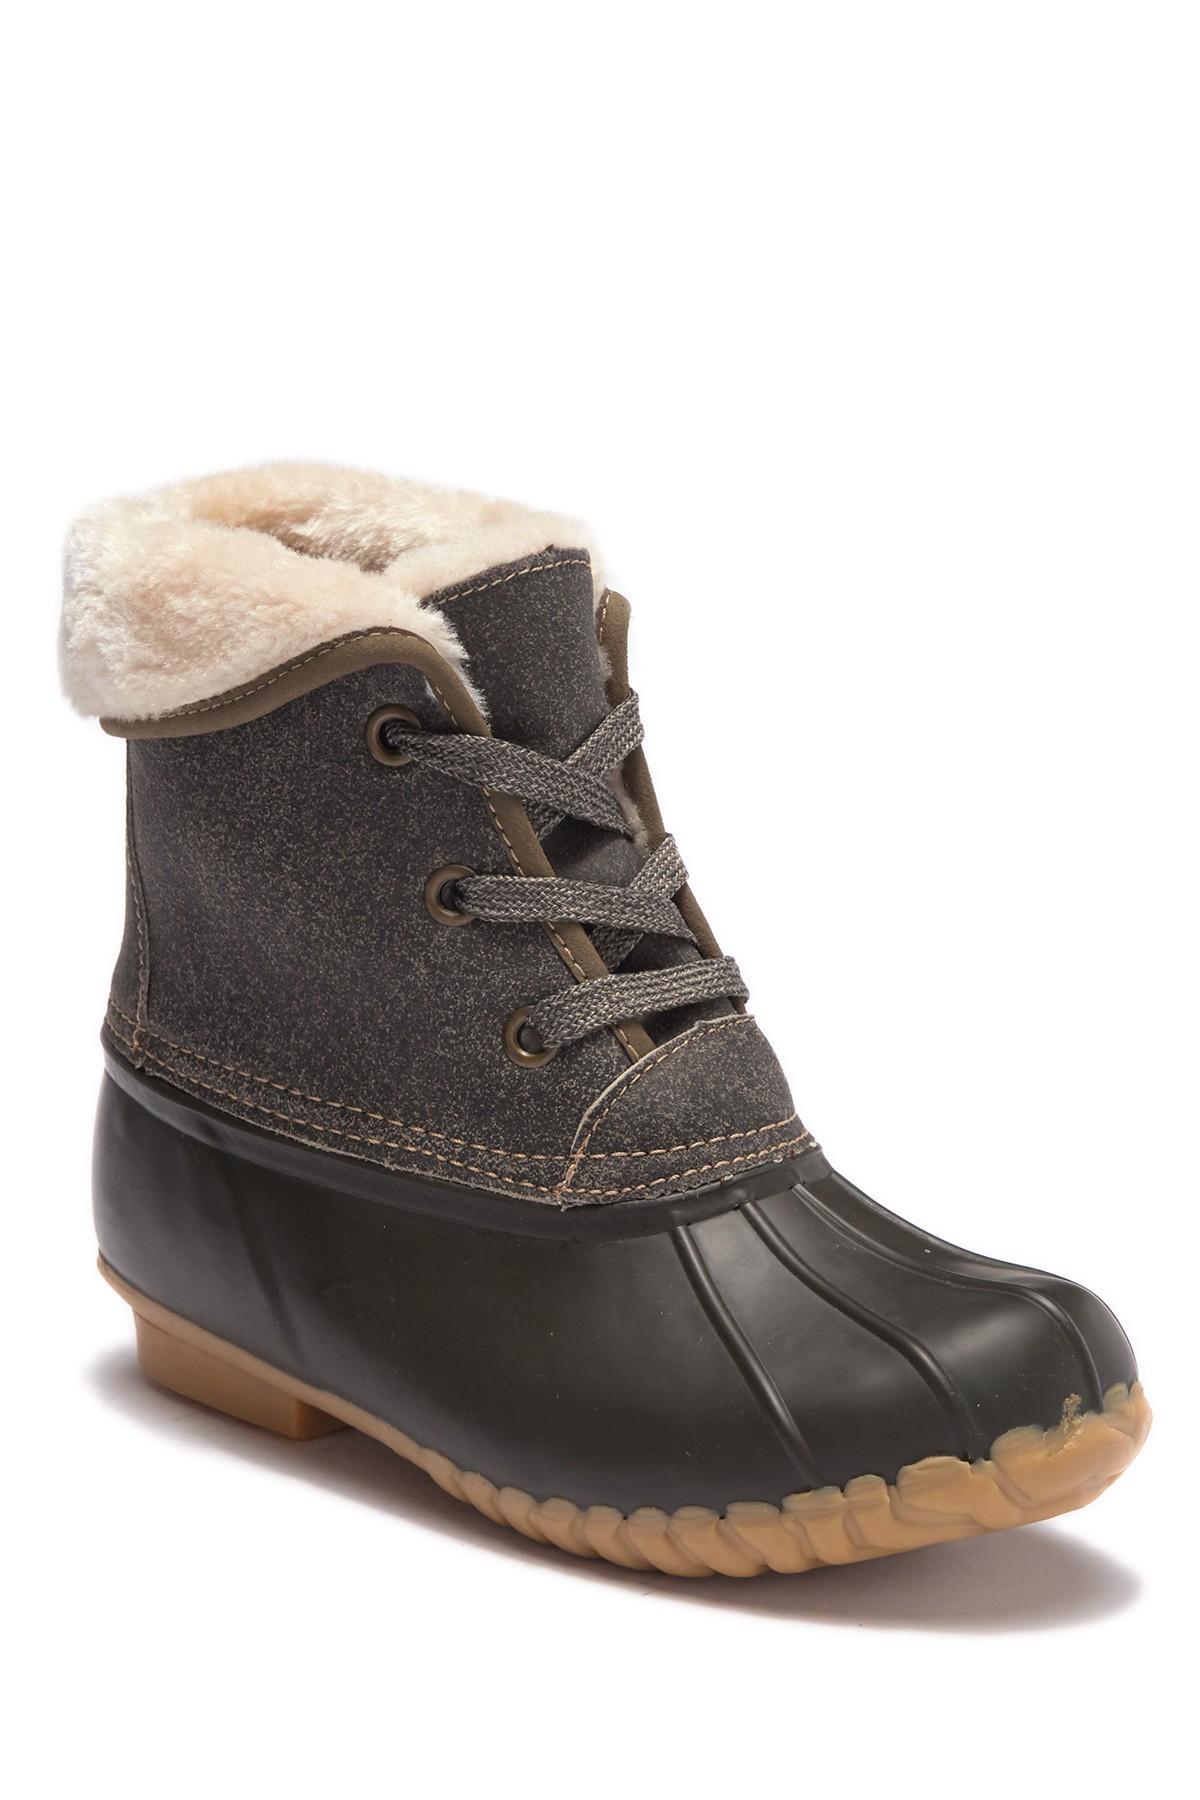 35a9900311b Lyst - Sporto Degas 2 Faux Fur Duck Boot